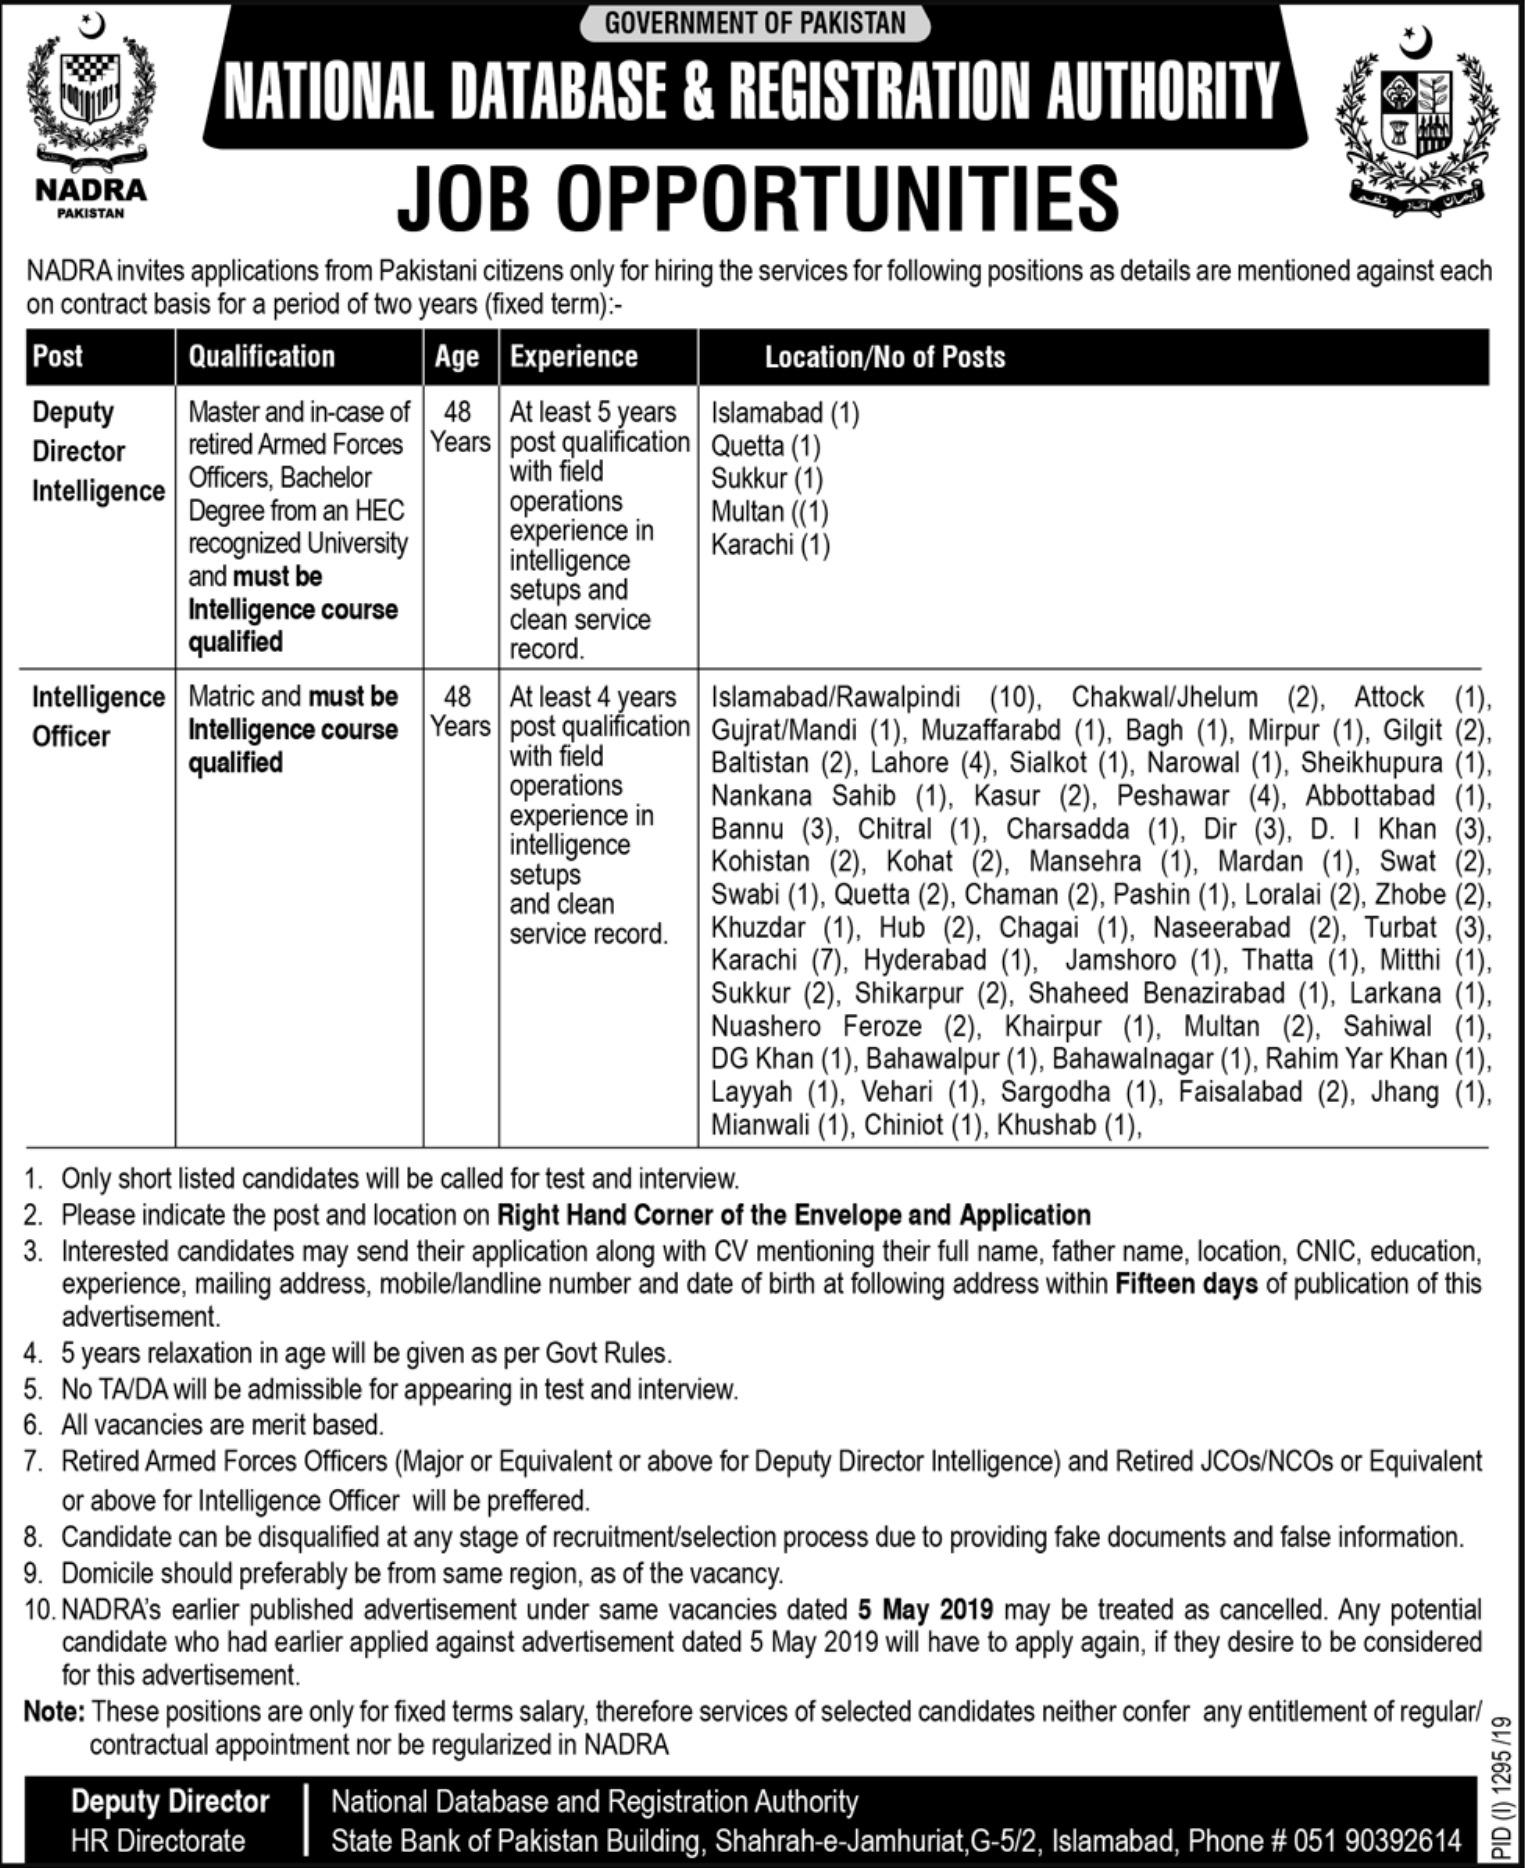 Photo of NADRA Latest Jobs 2019 | 500+ Vacancies | Latest Vacancies in All Pakistan